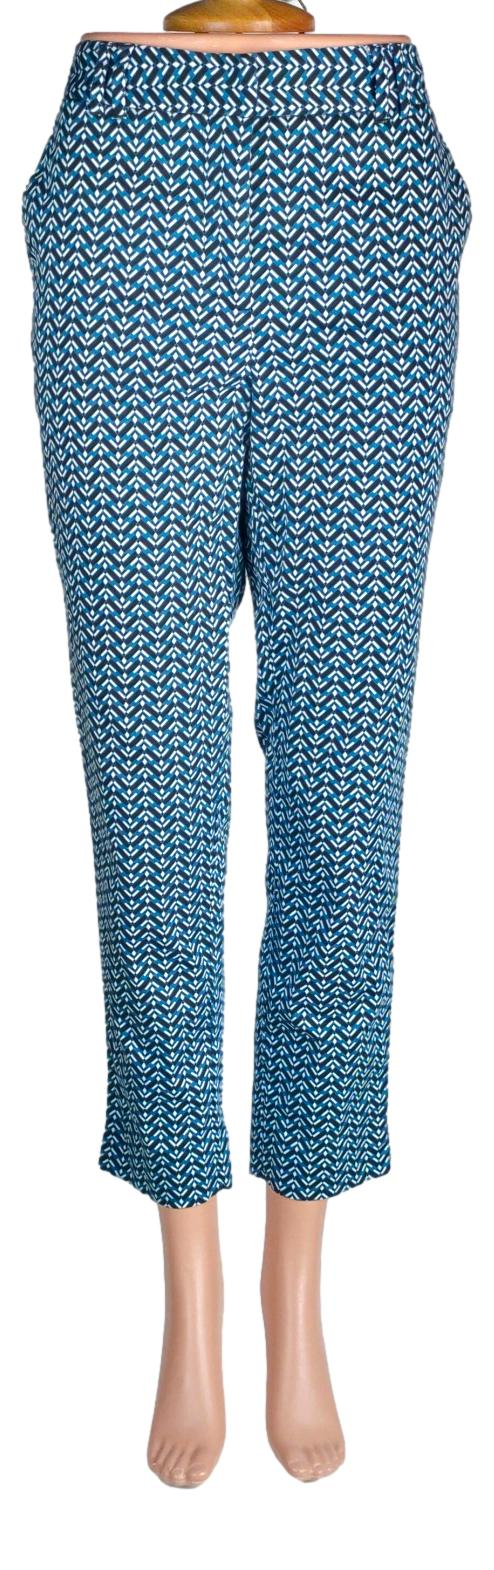 Pantalon Kiabi -Taille 40